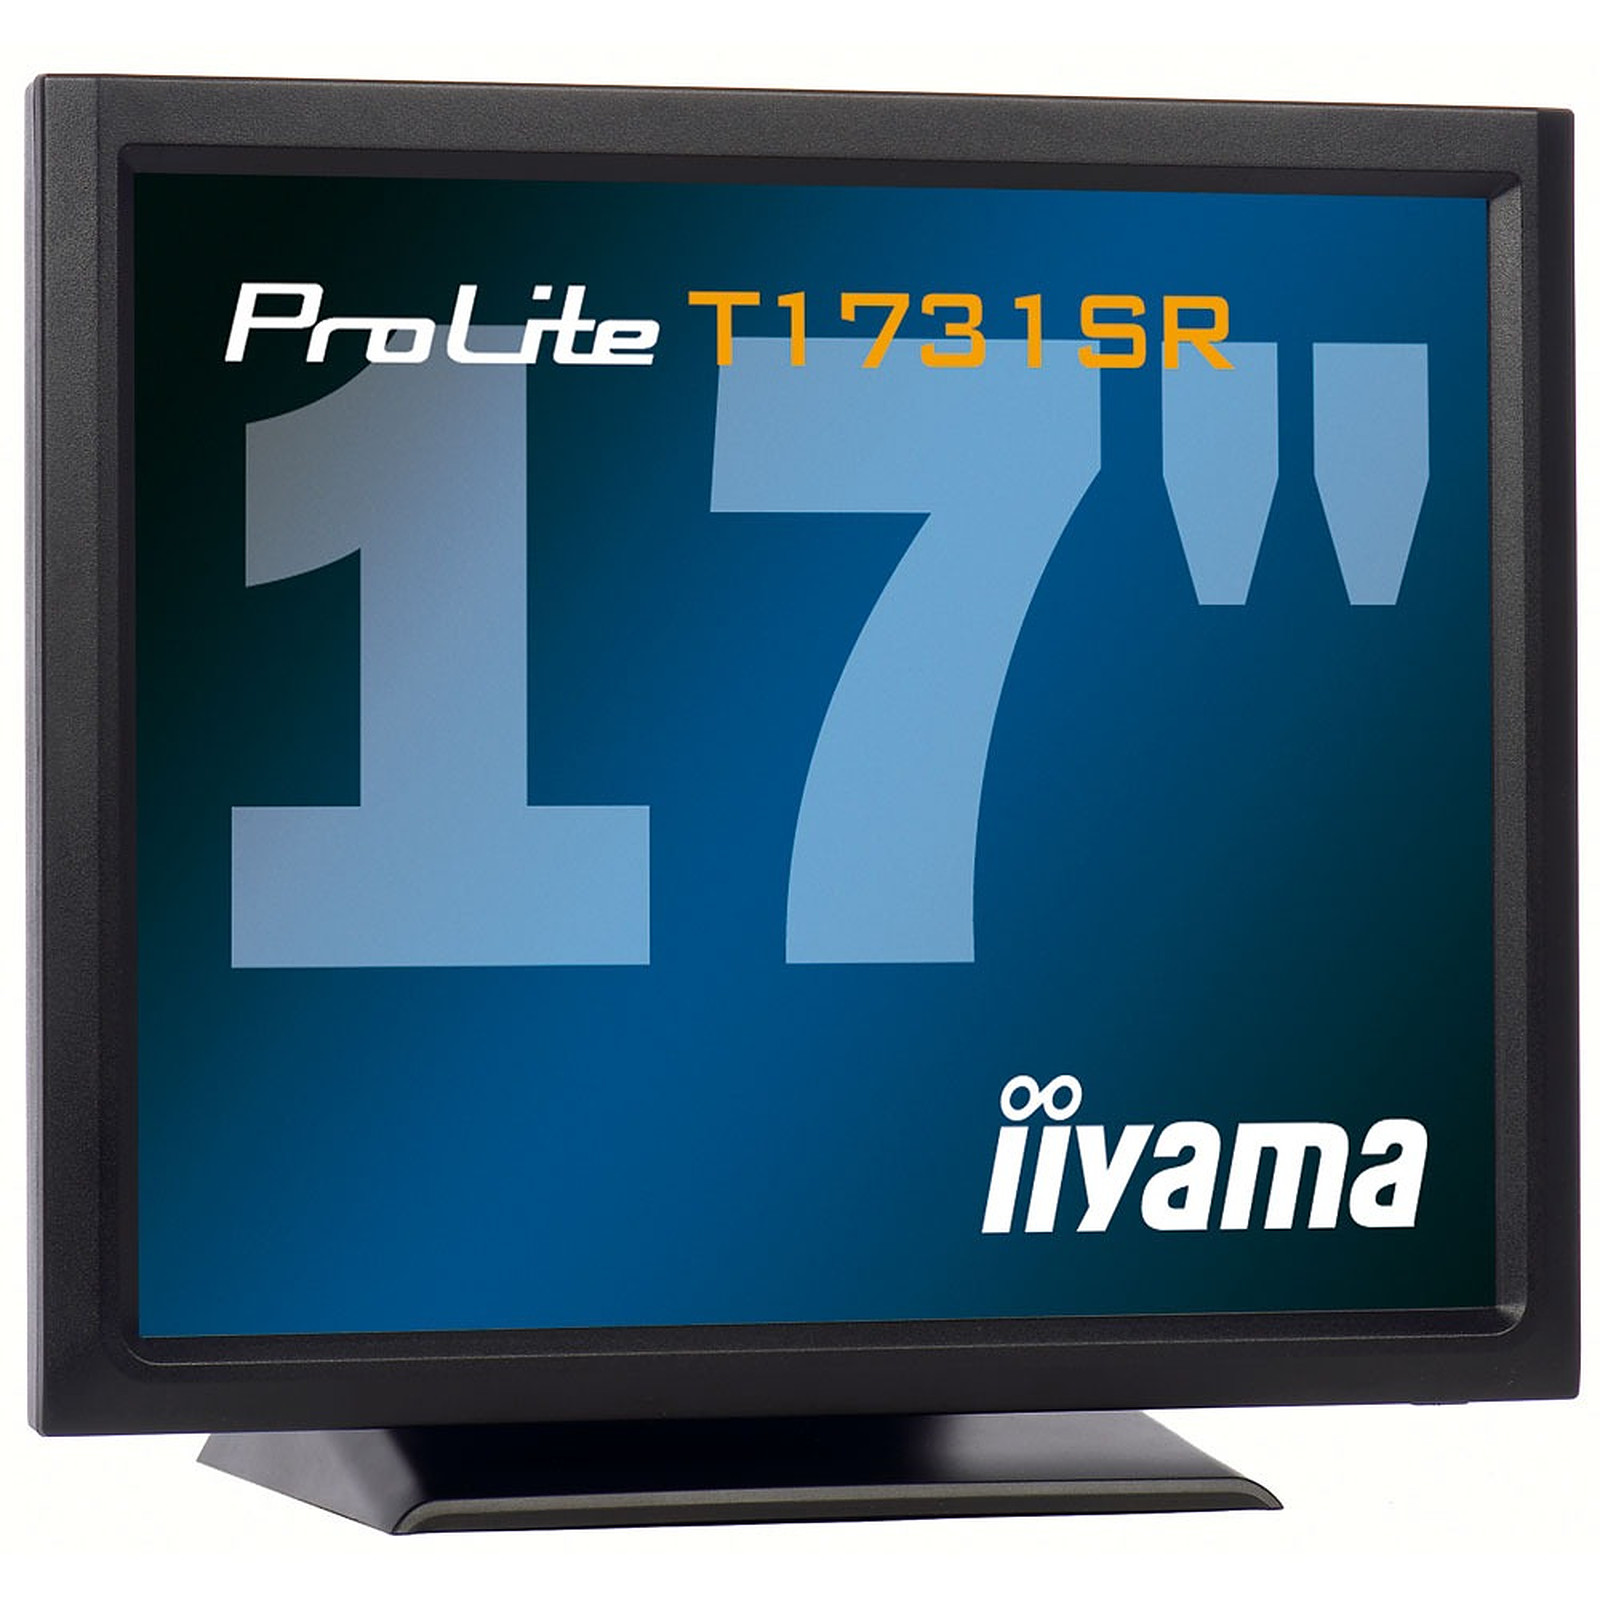 "iiyama 17"" LCD Tactile - ProLite T1731SR-1"